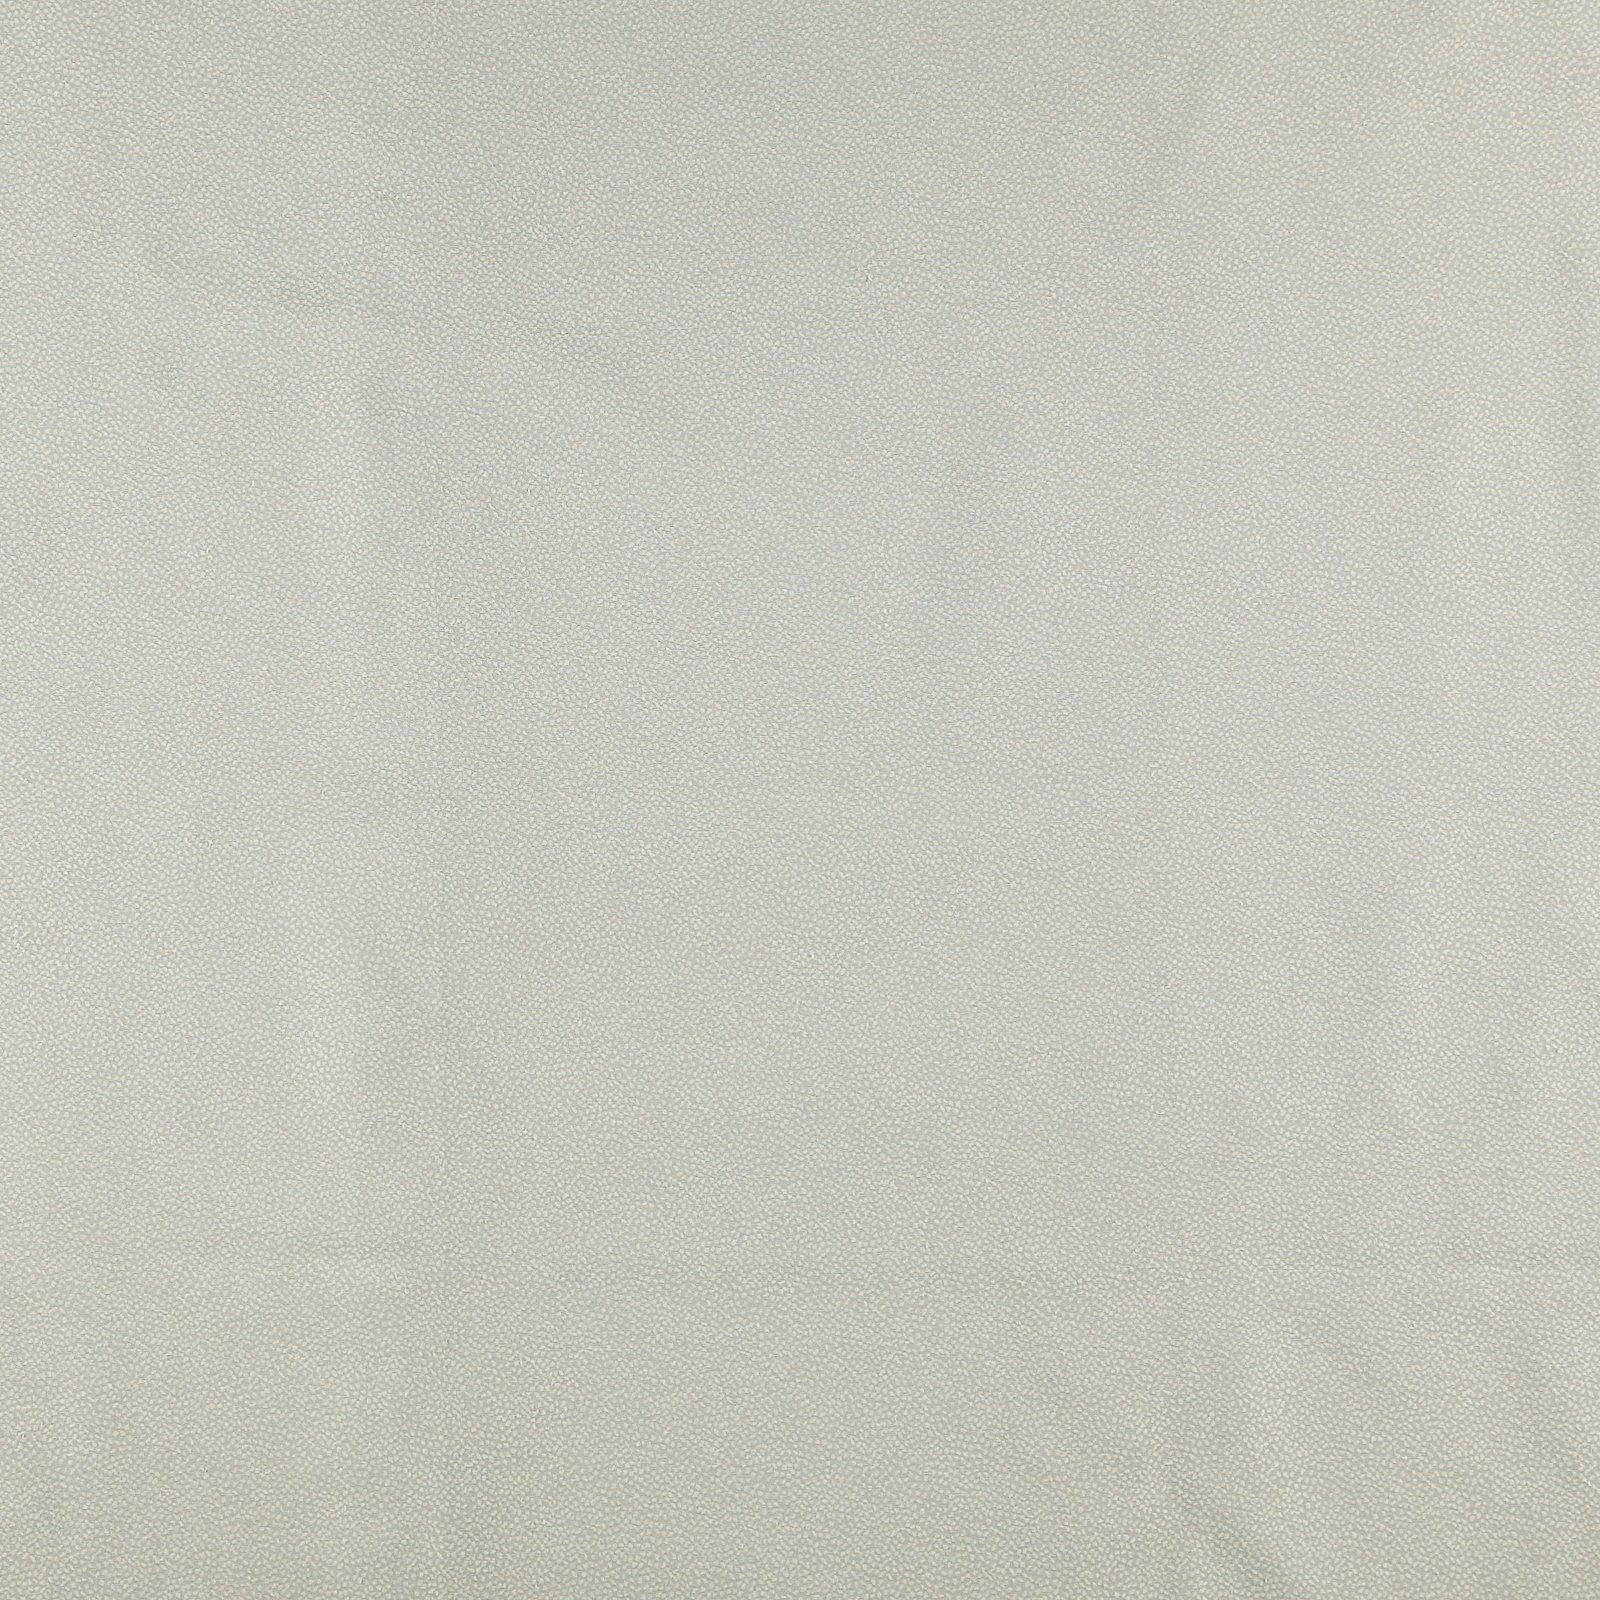 Jacquard light grey w nature pattern 803690_pack_sp